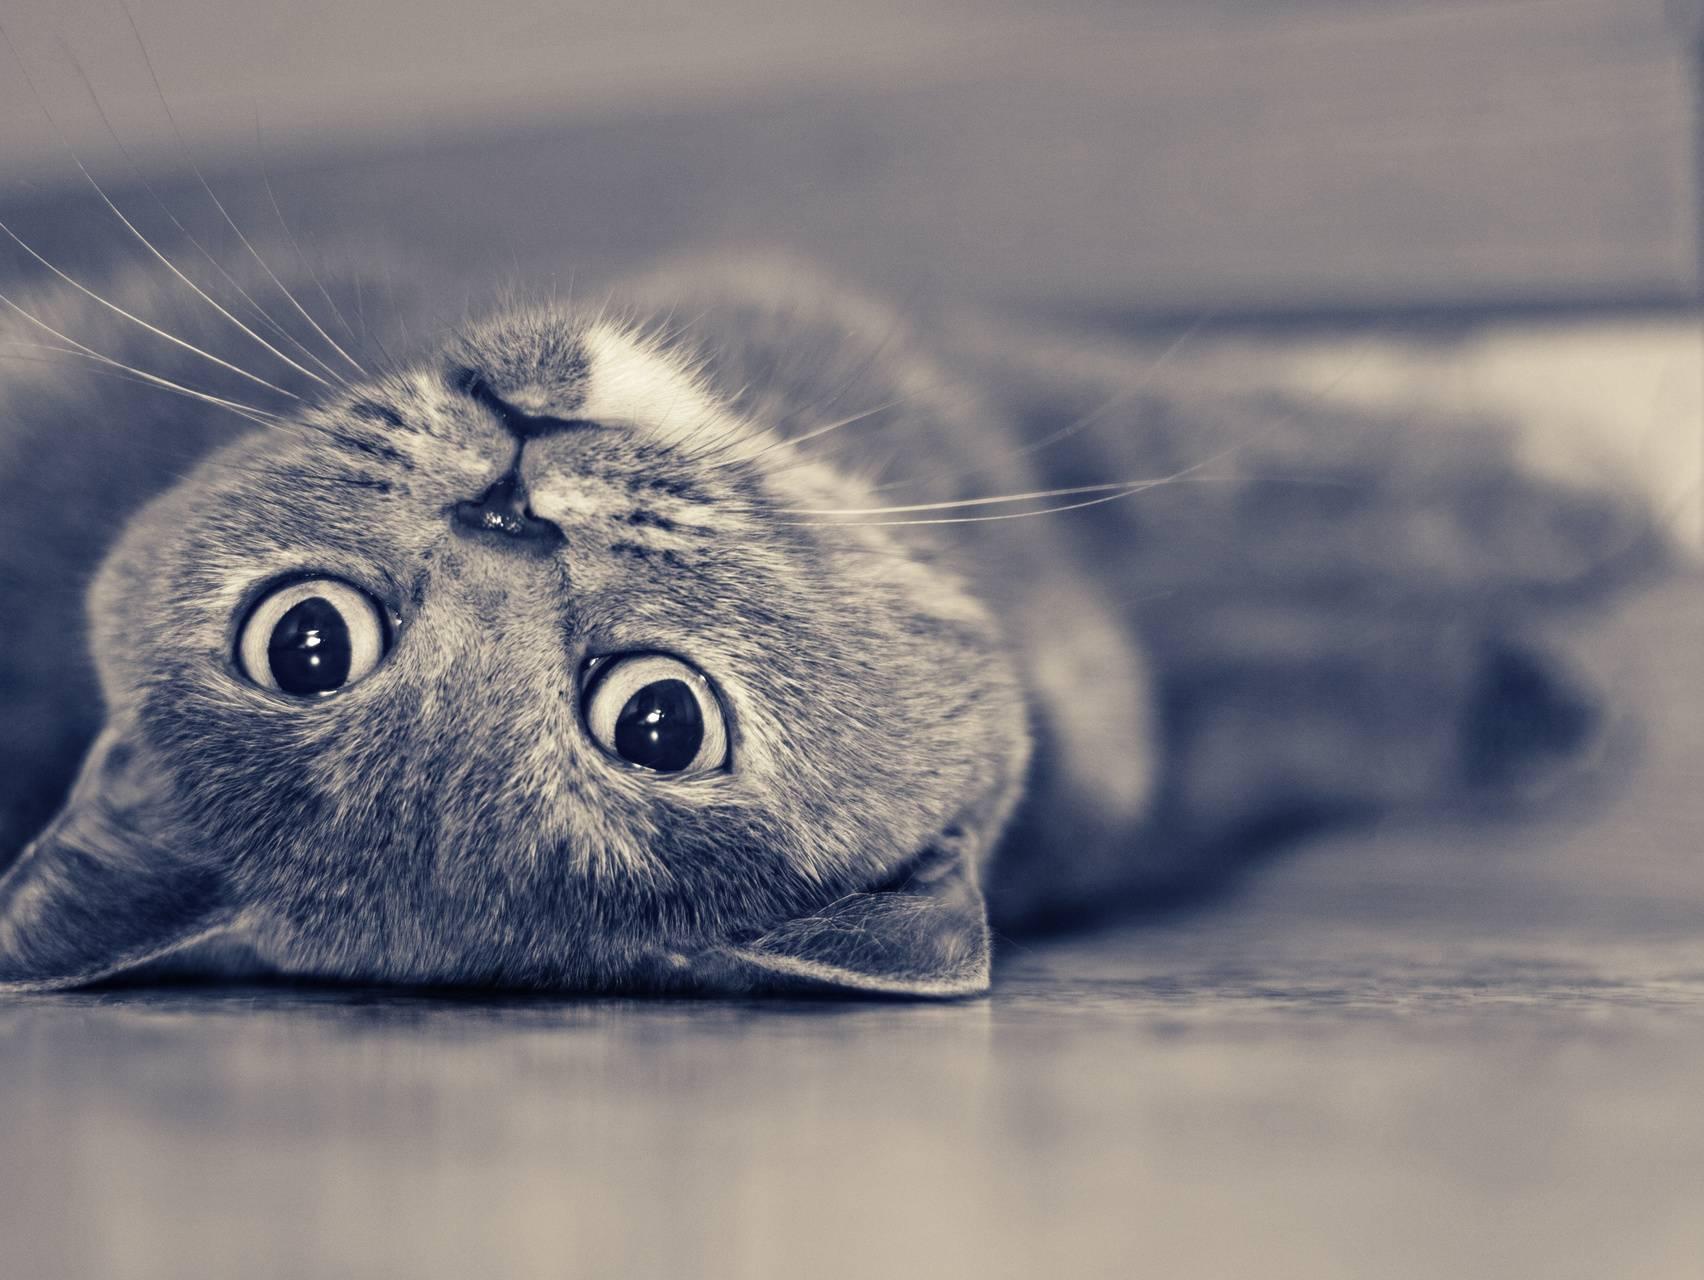 Cat On The Floor